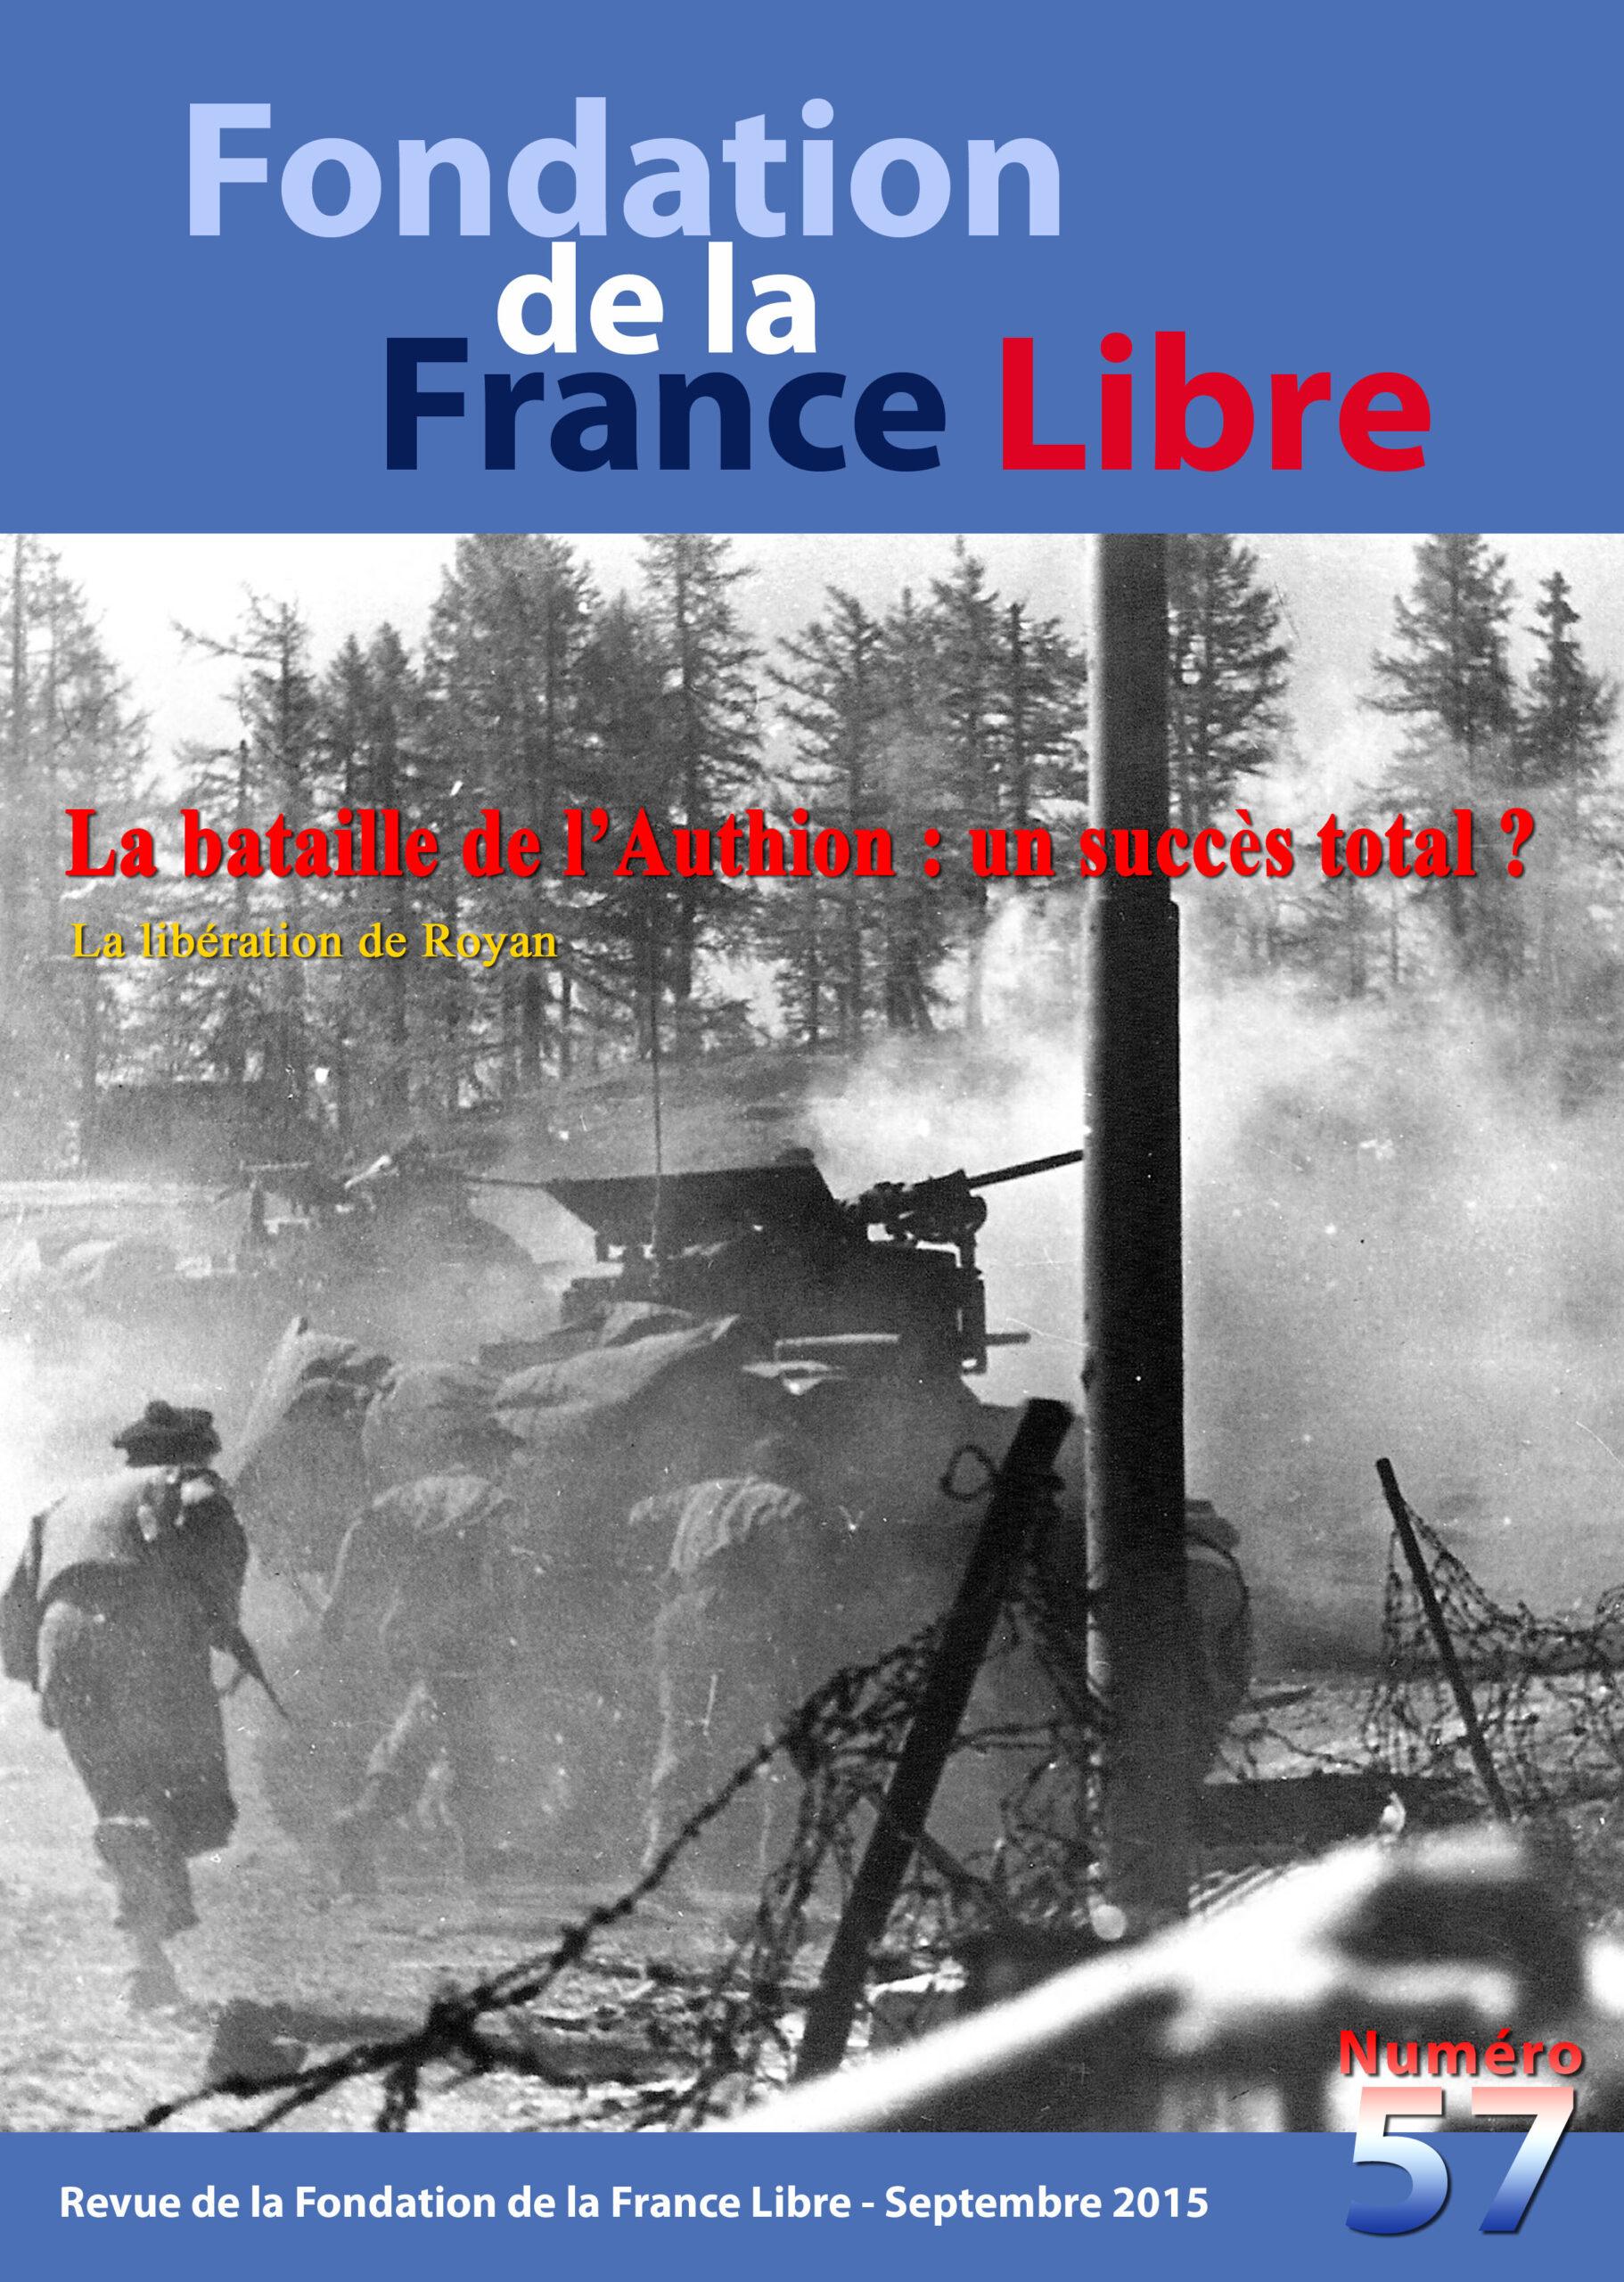 Fondation de la France Libre, n° 57, septembre 2015